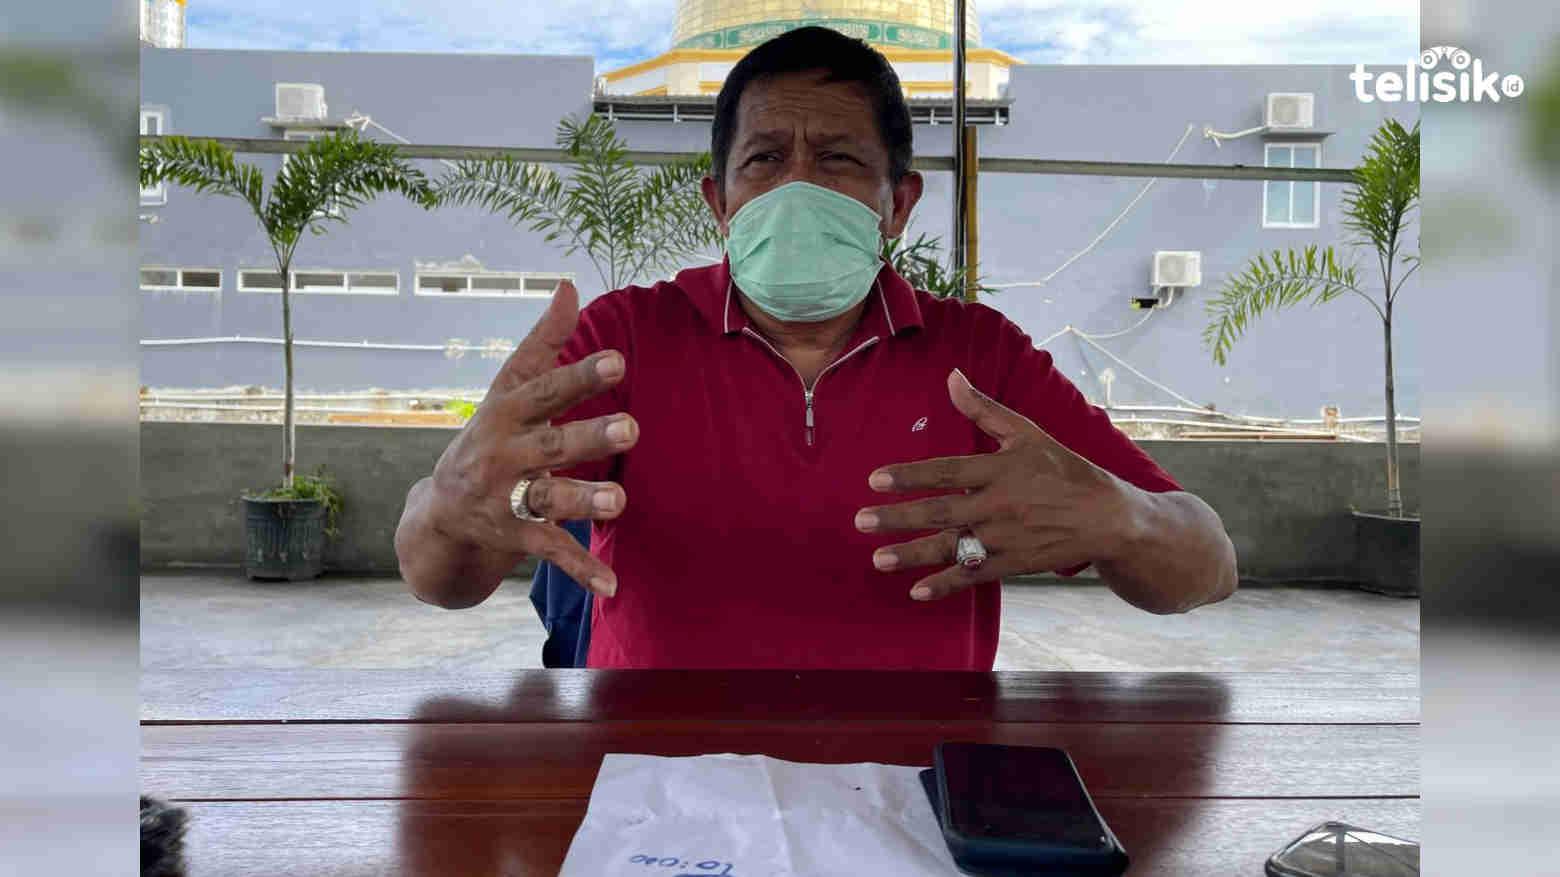 Anggota DPR Hugua Prihatin Insentif Petugas Pemulasaran Tak Sebanding dengan Resiko Kerjanya